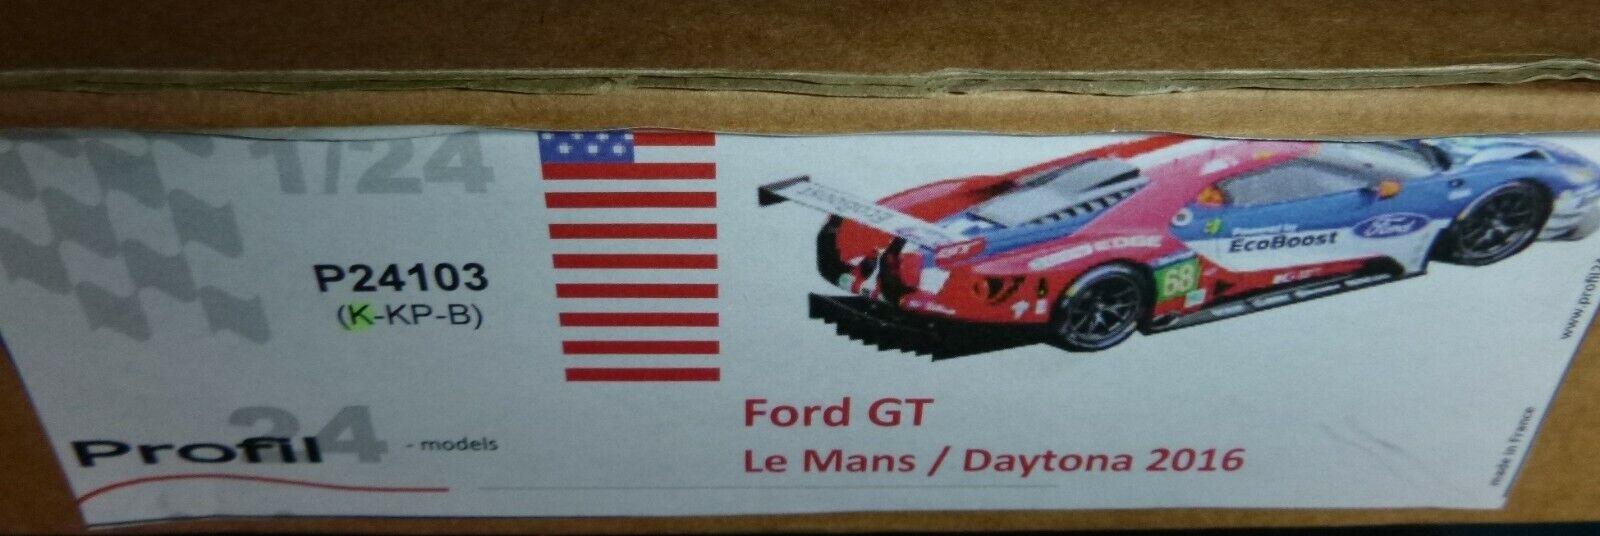 Profil 24 P24103 Ford Gt le Uomo Daytona 2016 Resina Kit 1 24 Vettura Mountain